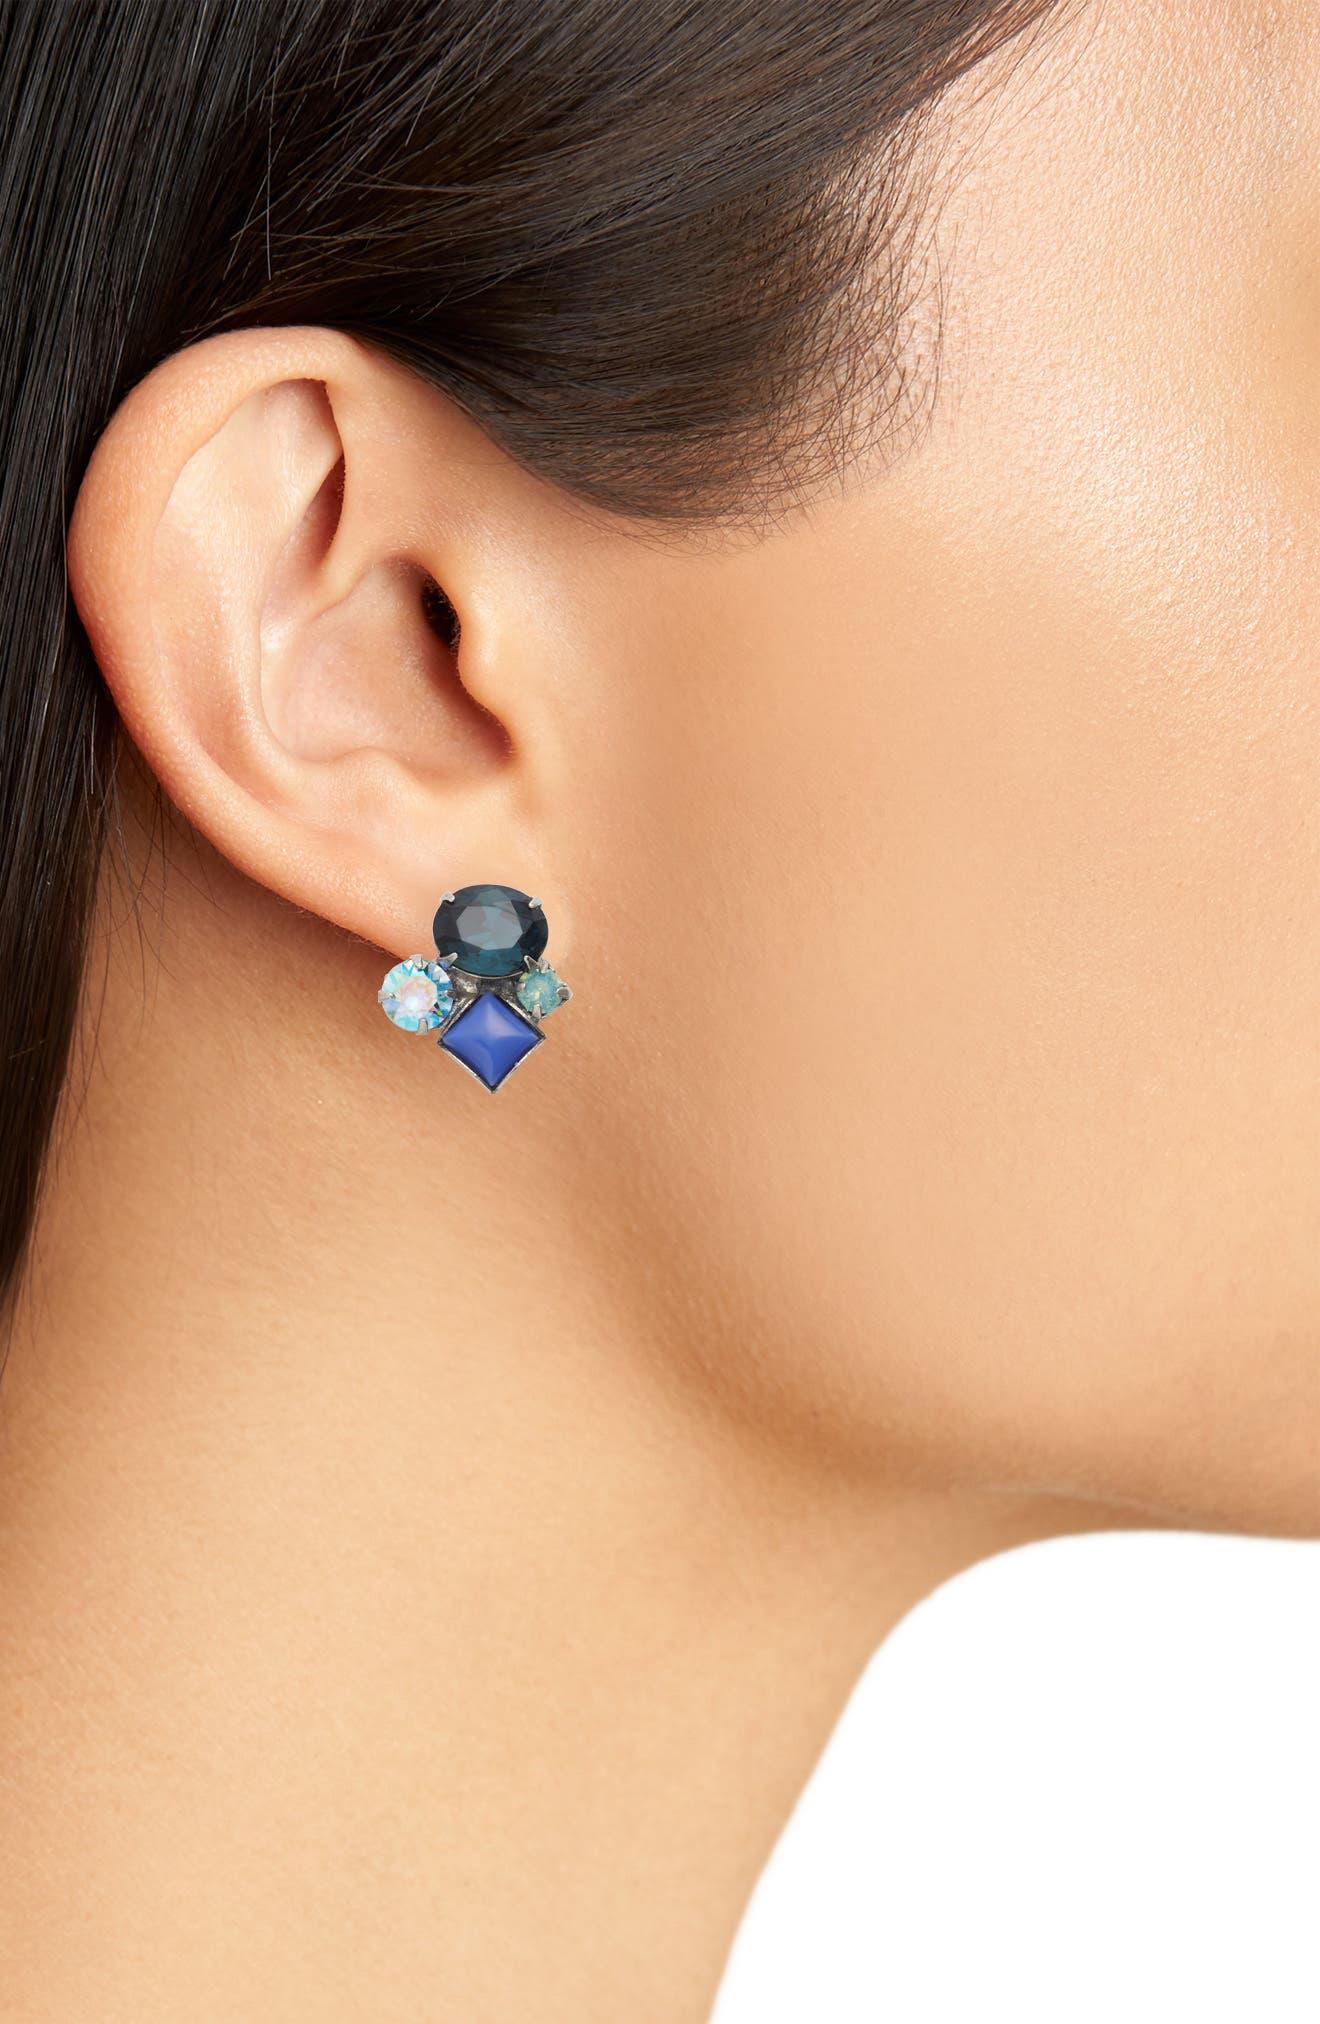 Ivy Earrings,                             Alternate thumbnail 2, color,                             400